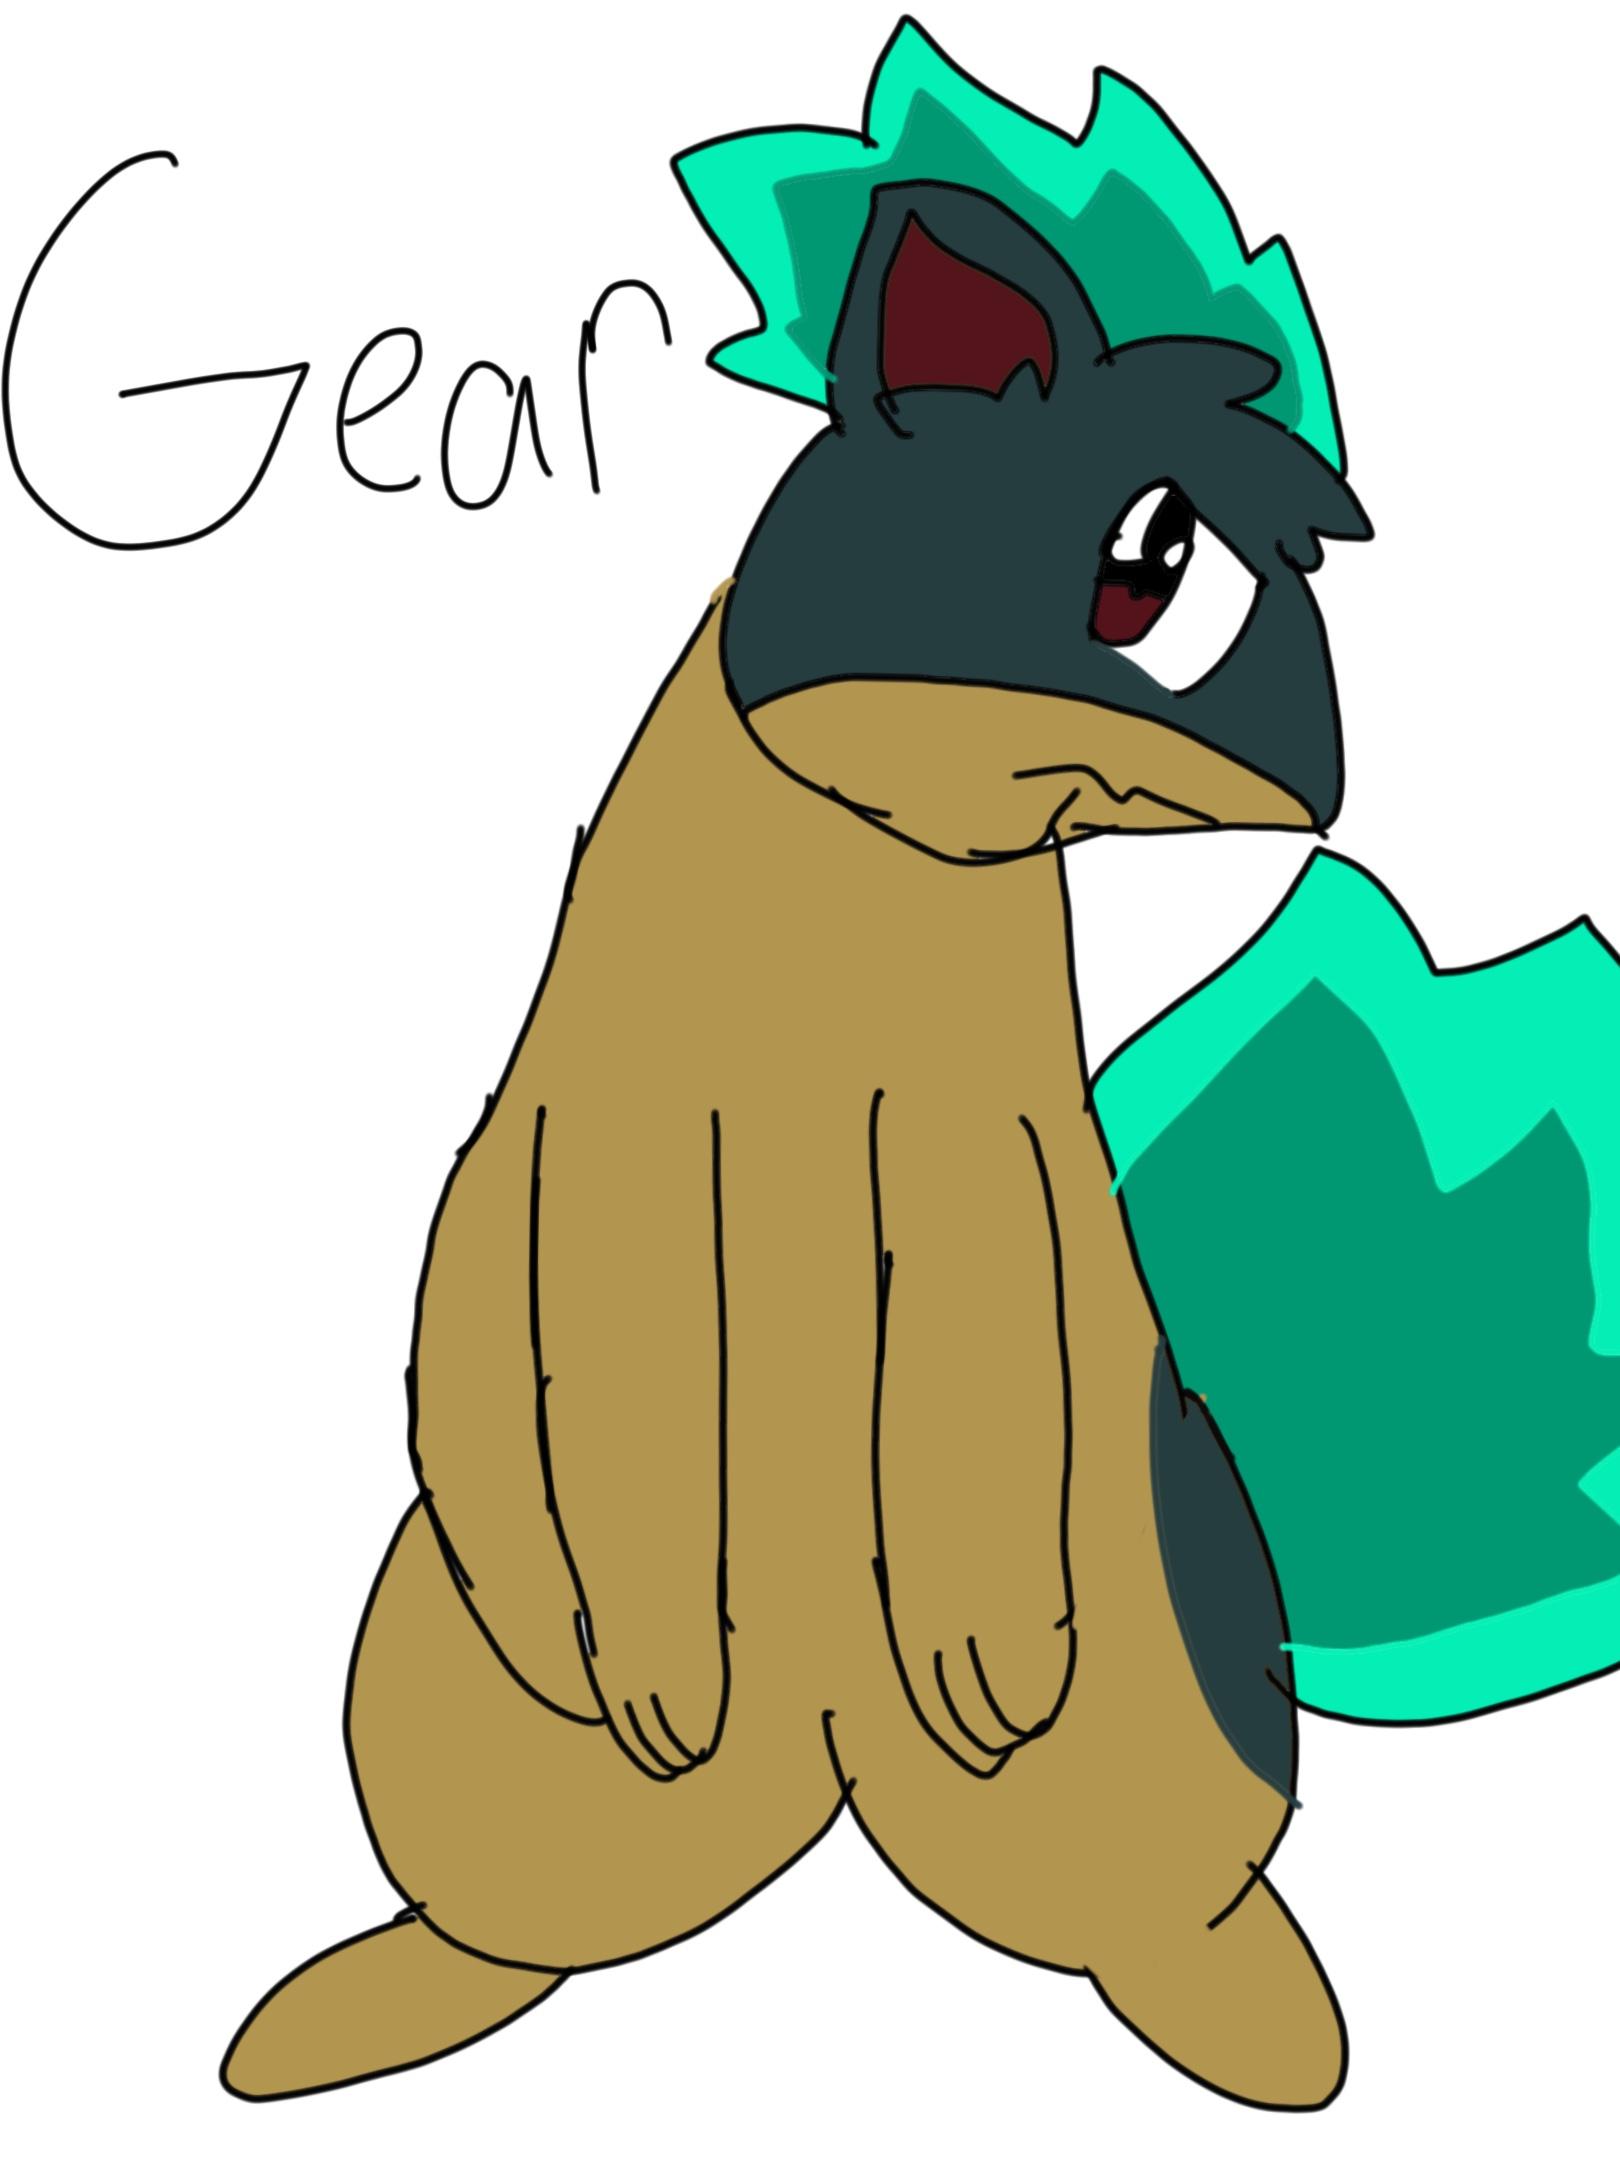 Gear the Quillava (for Nettarine79)